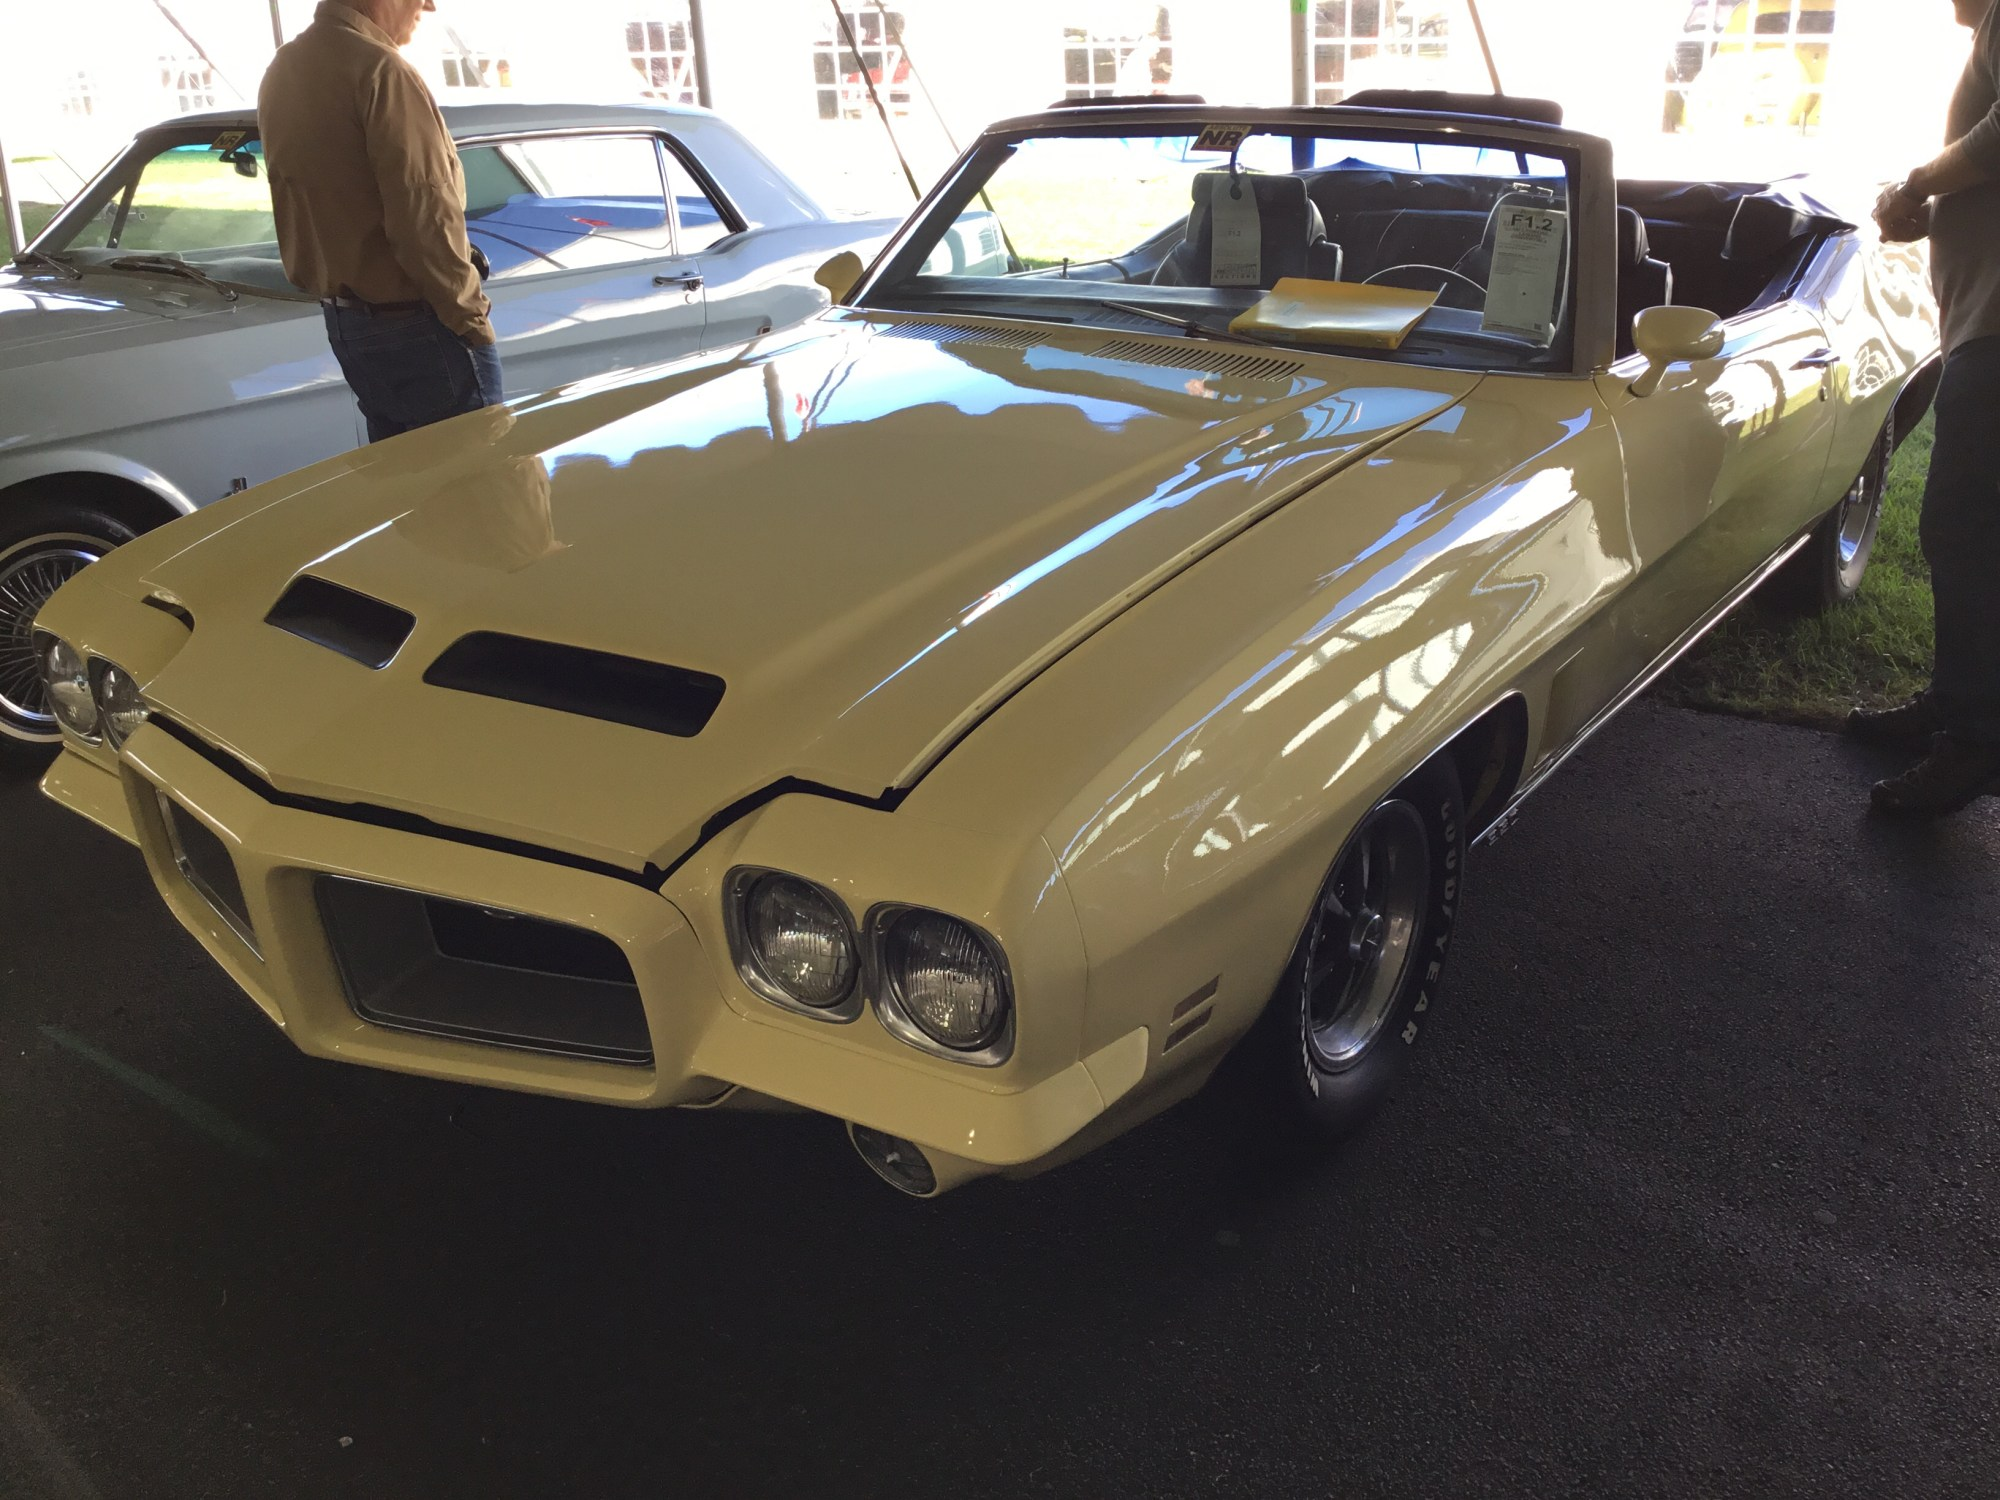 hight resolution of 1972 pontiac lemans sport convertible 8 cyl 350cid 160hp 2bbl